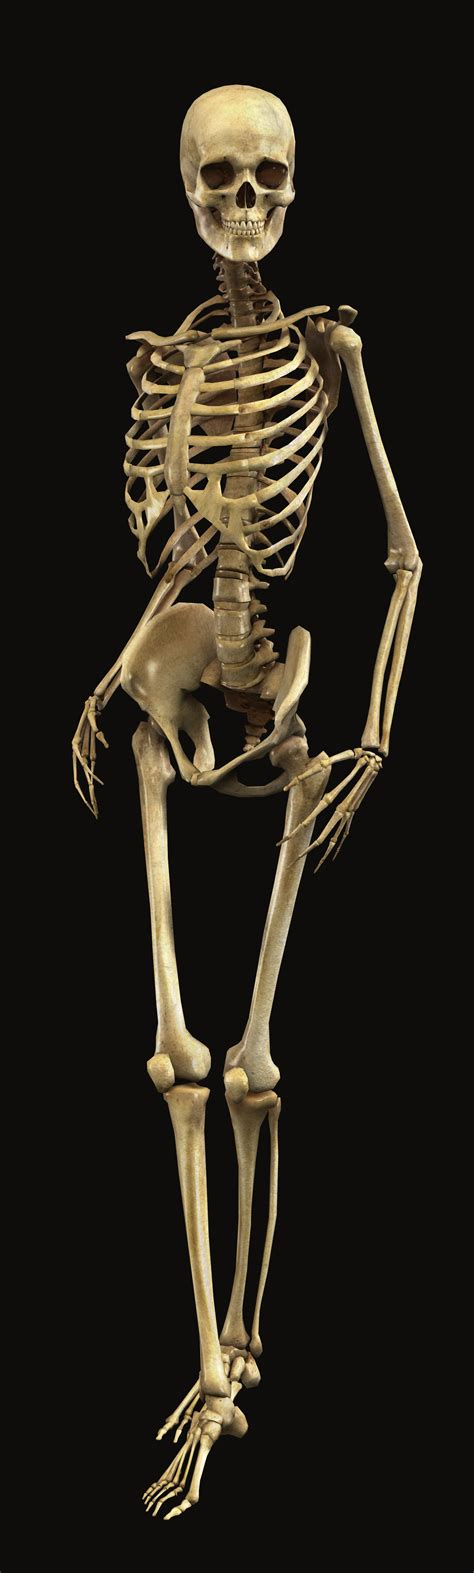 Bryan Brandenburg Official Human Skeleton